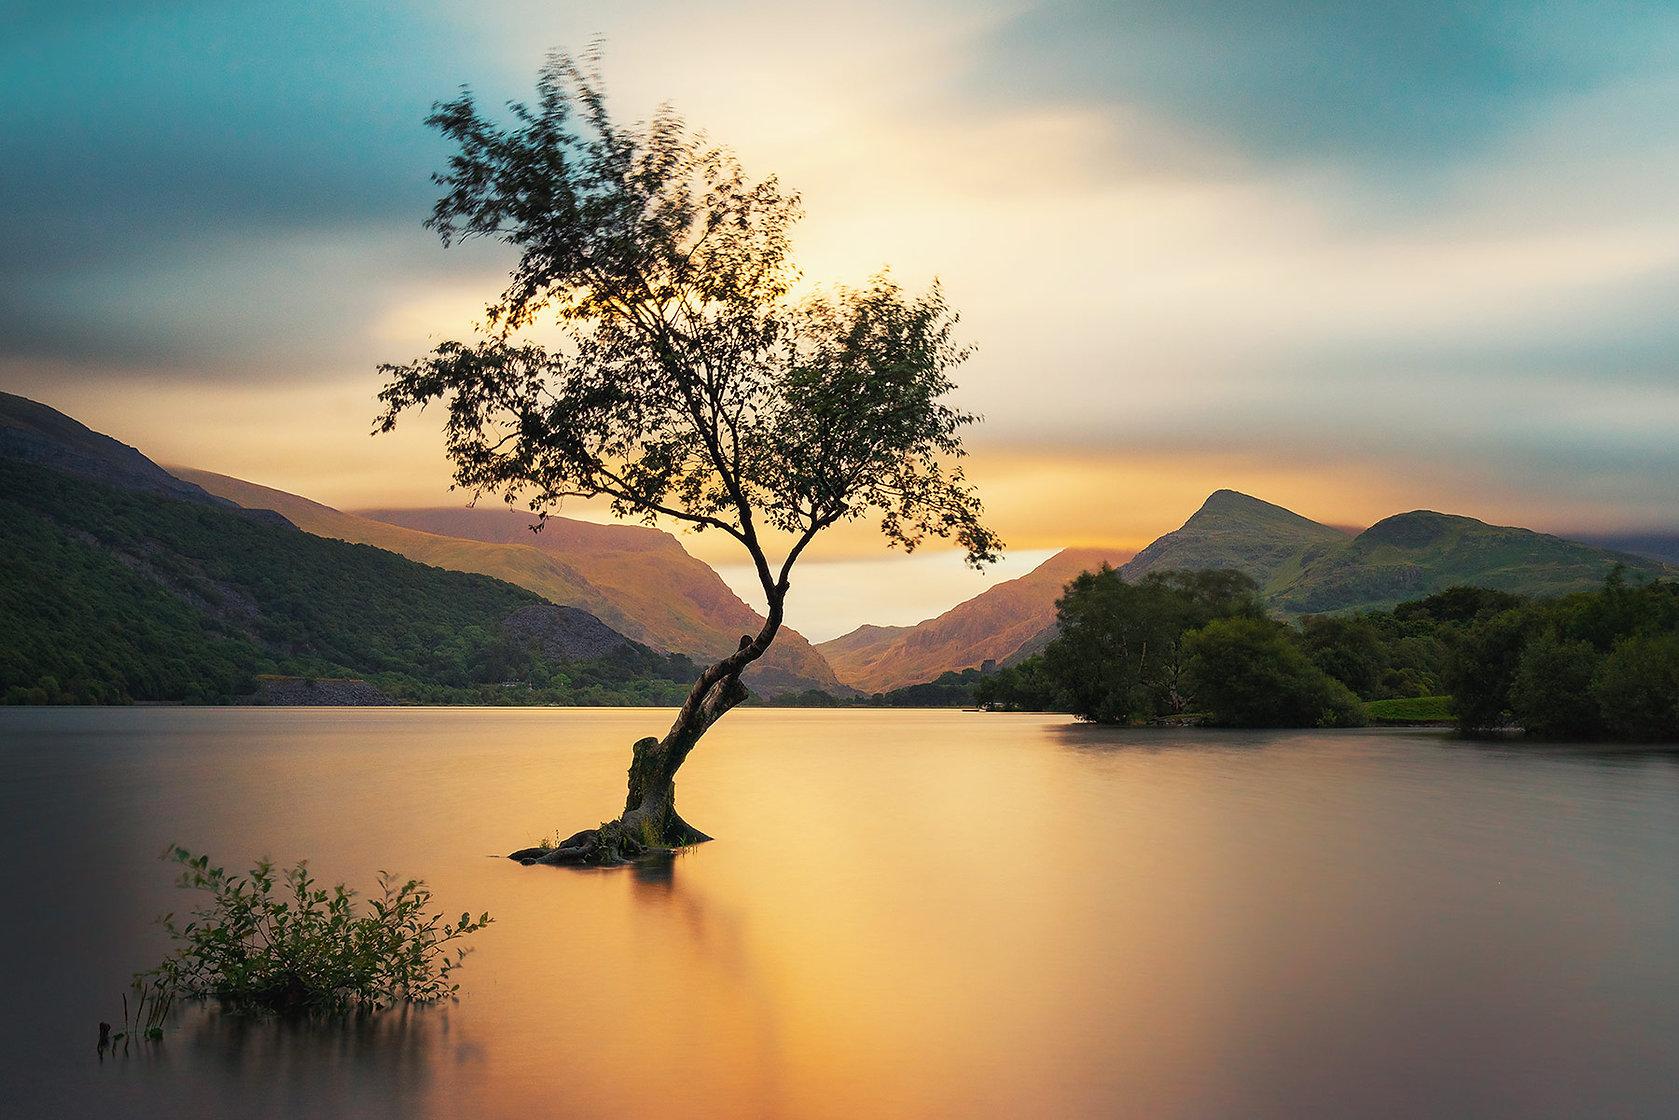 solitary-tree.jpg